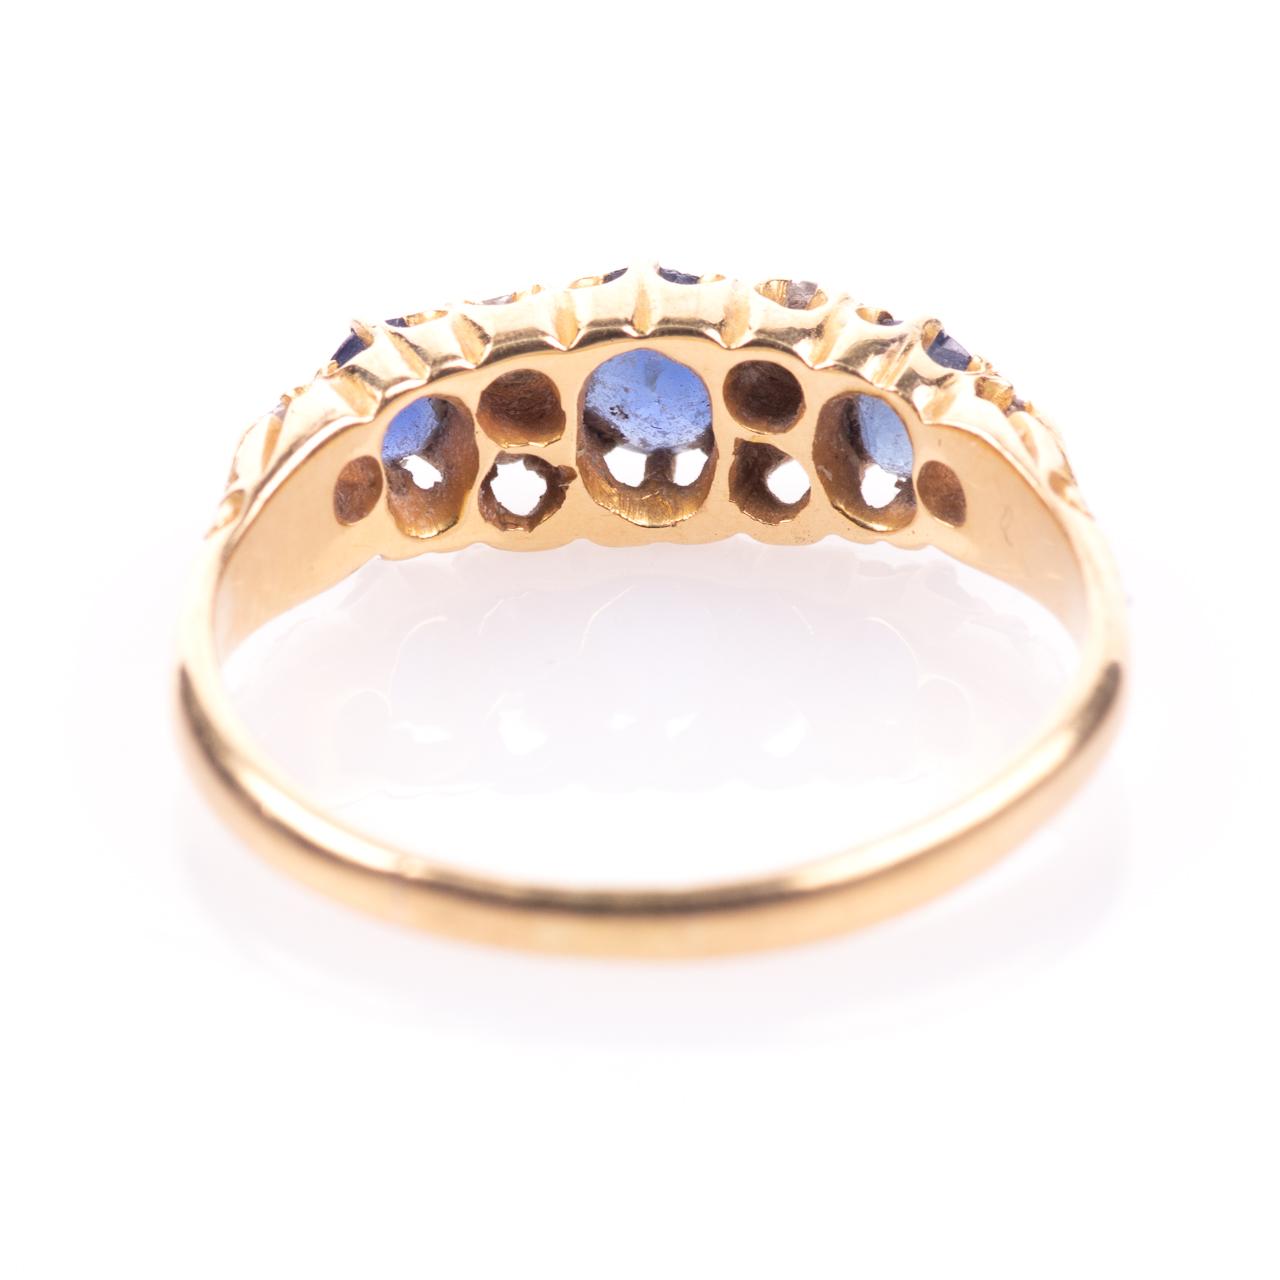 18ct Gold George V 1ct Sapphire & Diamond Ring London 1908 - Image 6 of 7